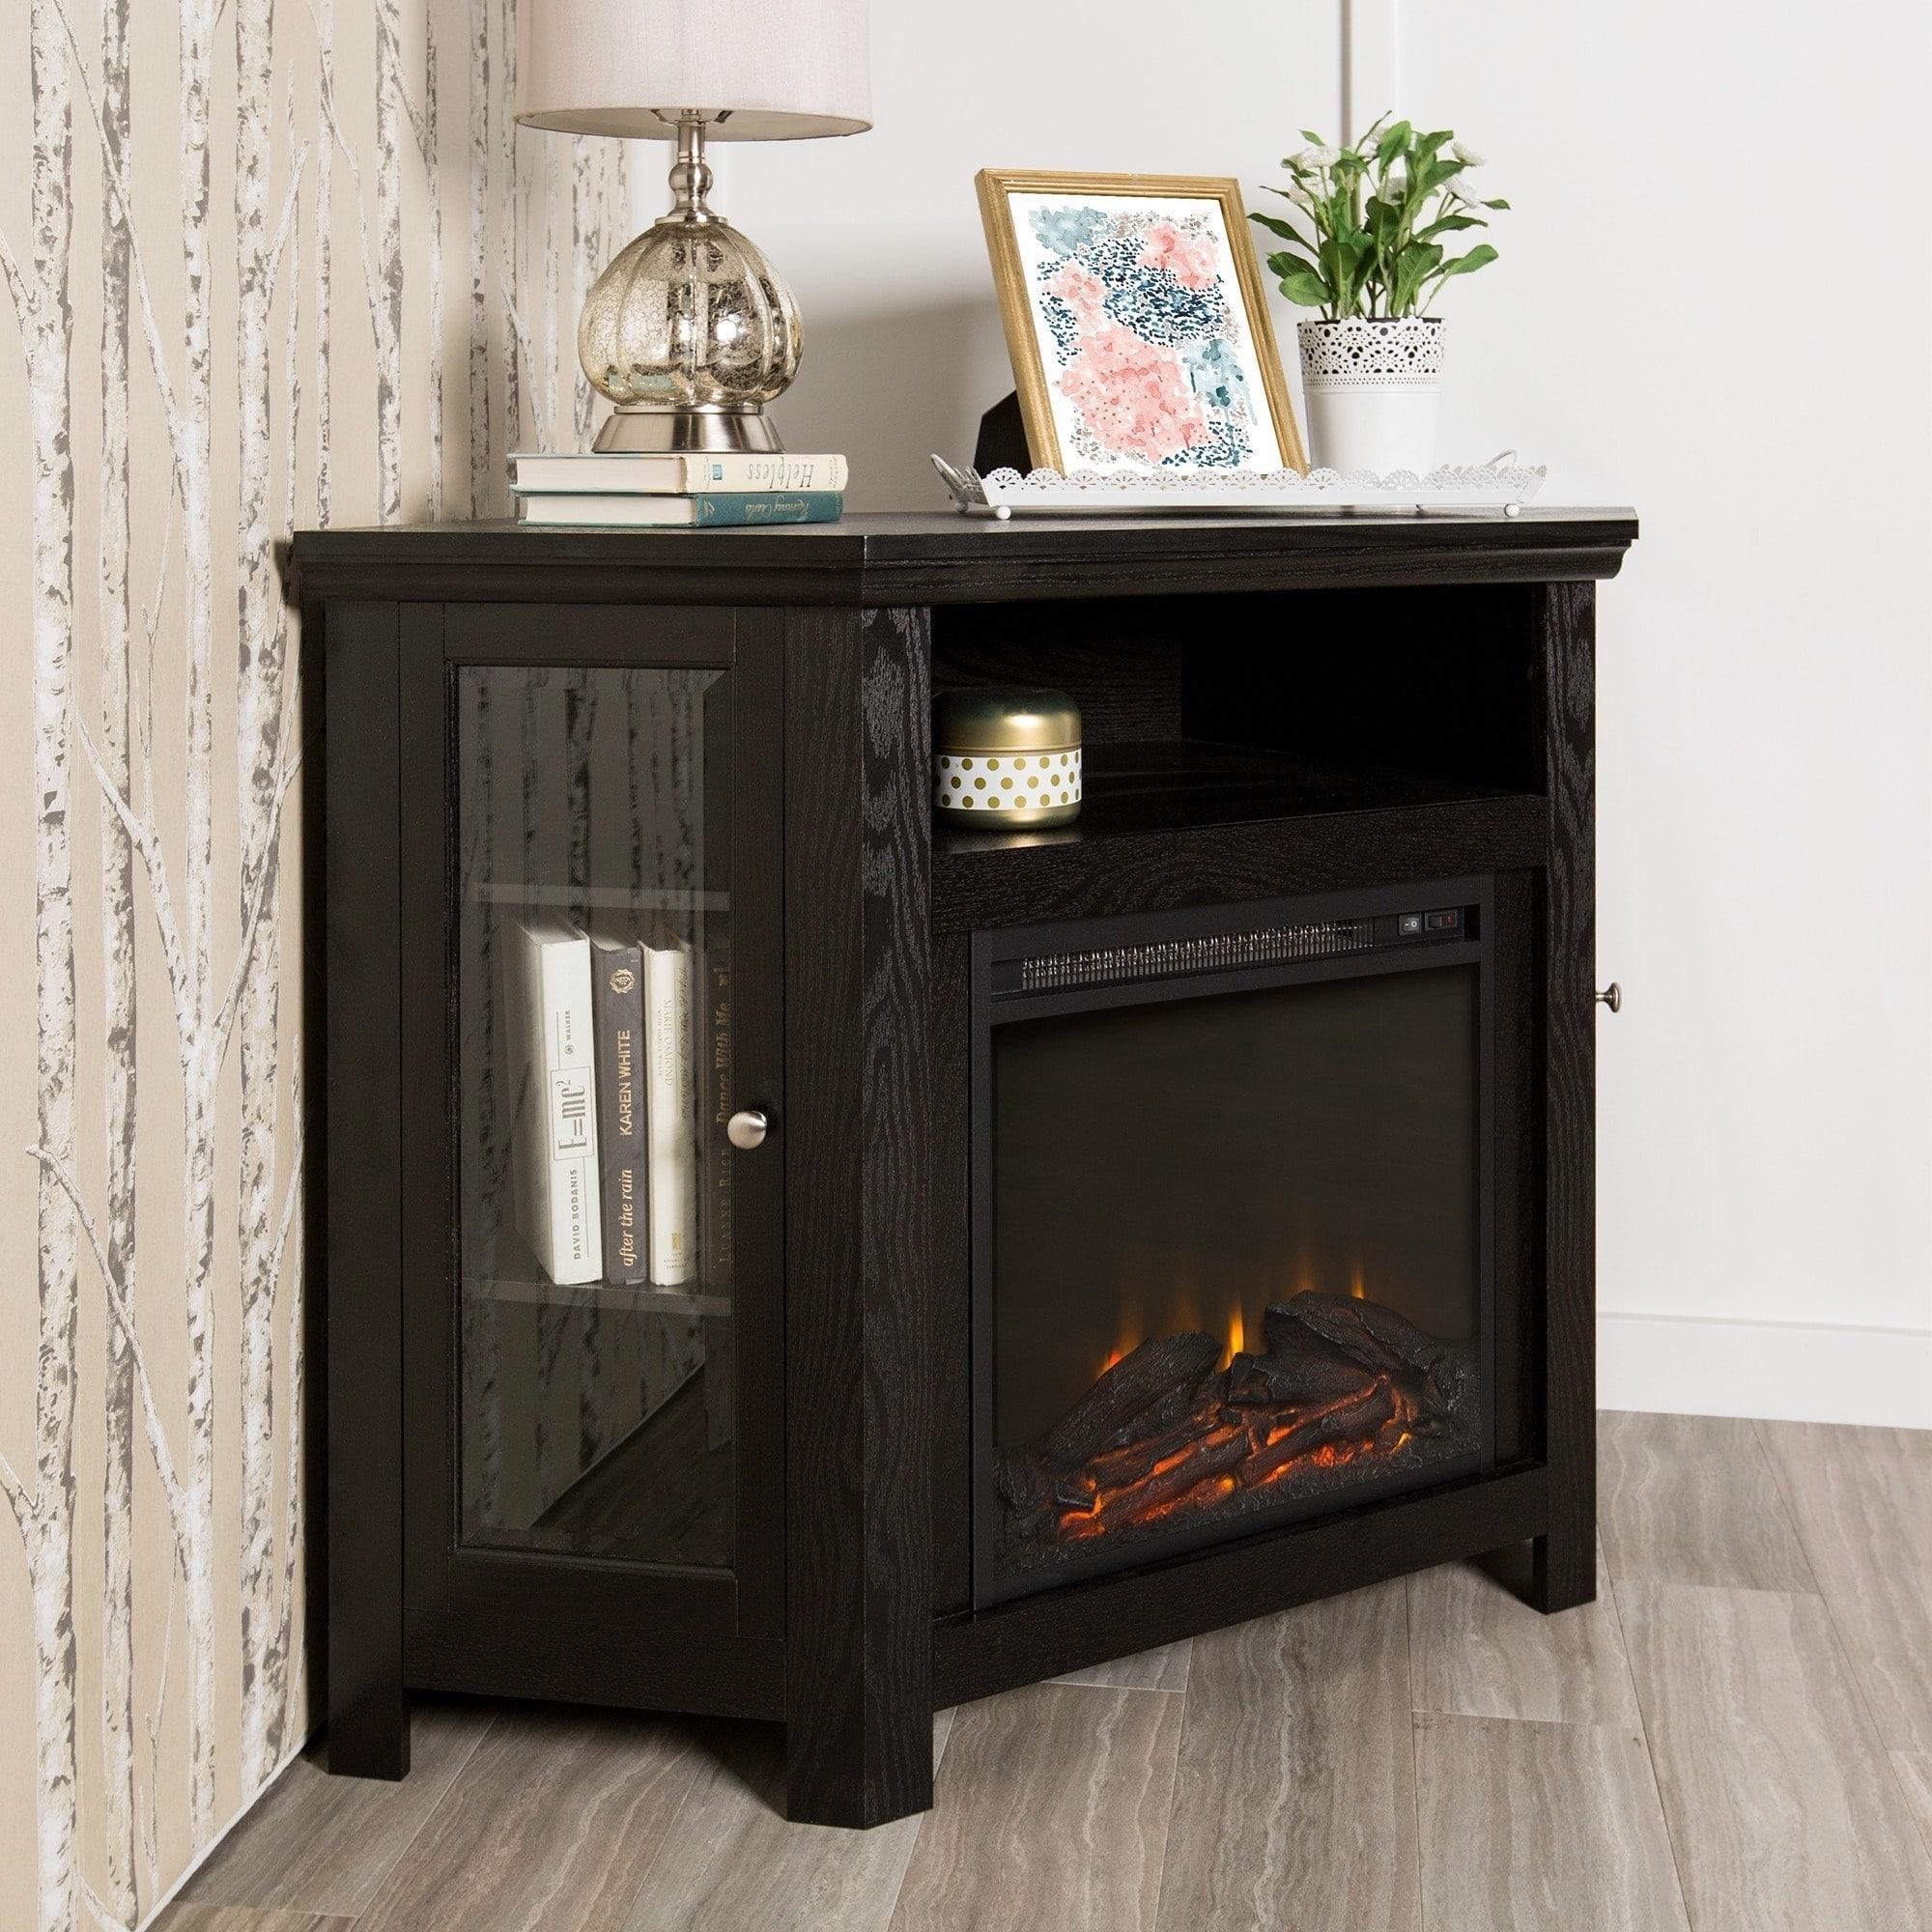 Shop 48 Corner Fireplace Tv Stand Console Black 48 X 20 X 32h